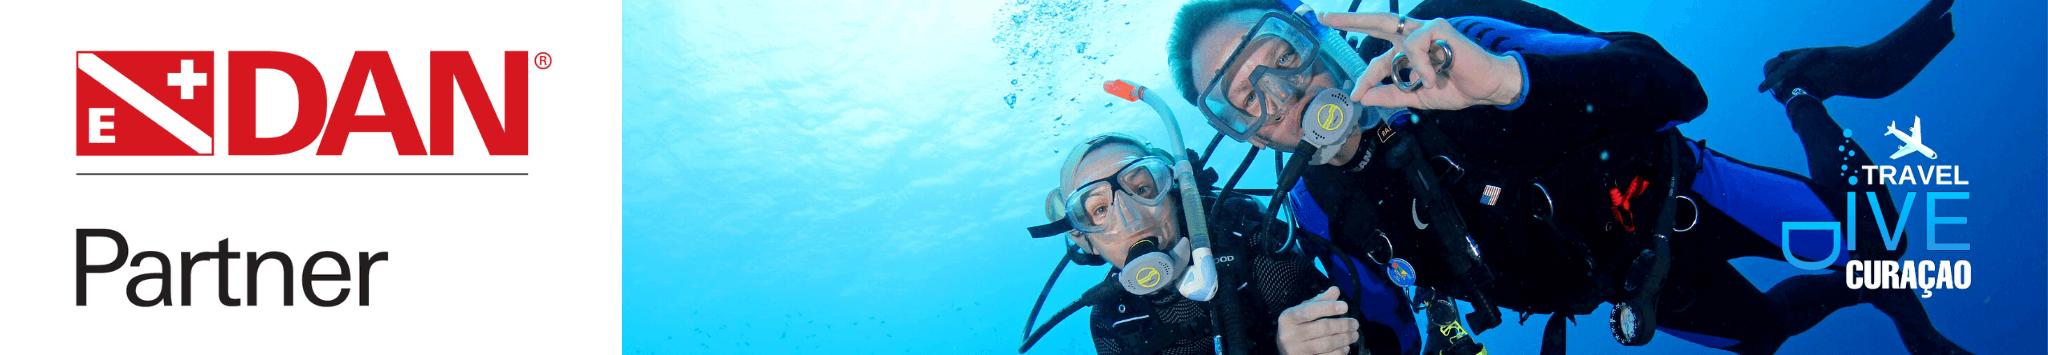 DAN Europe - Divers Alert Network Partner | Dive Travel Curacao